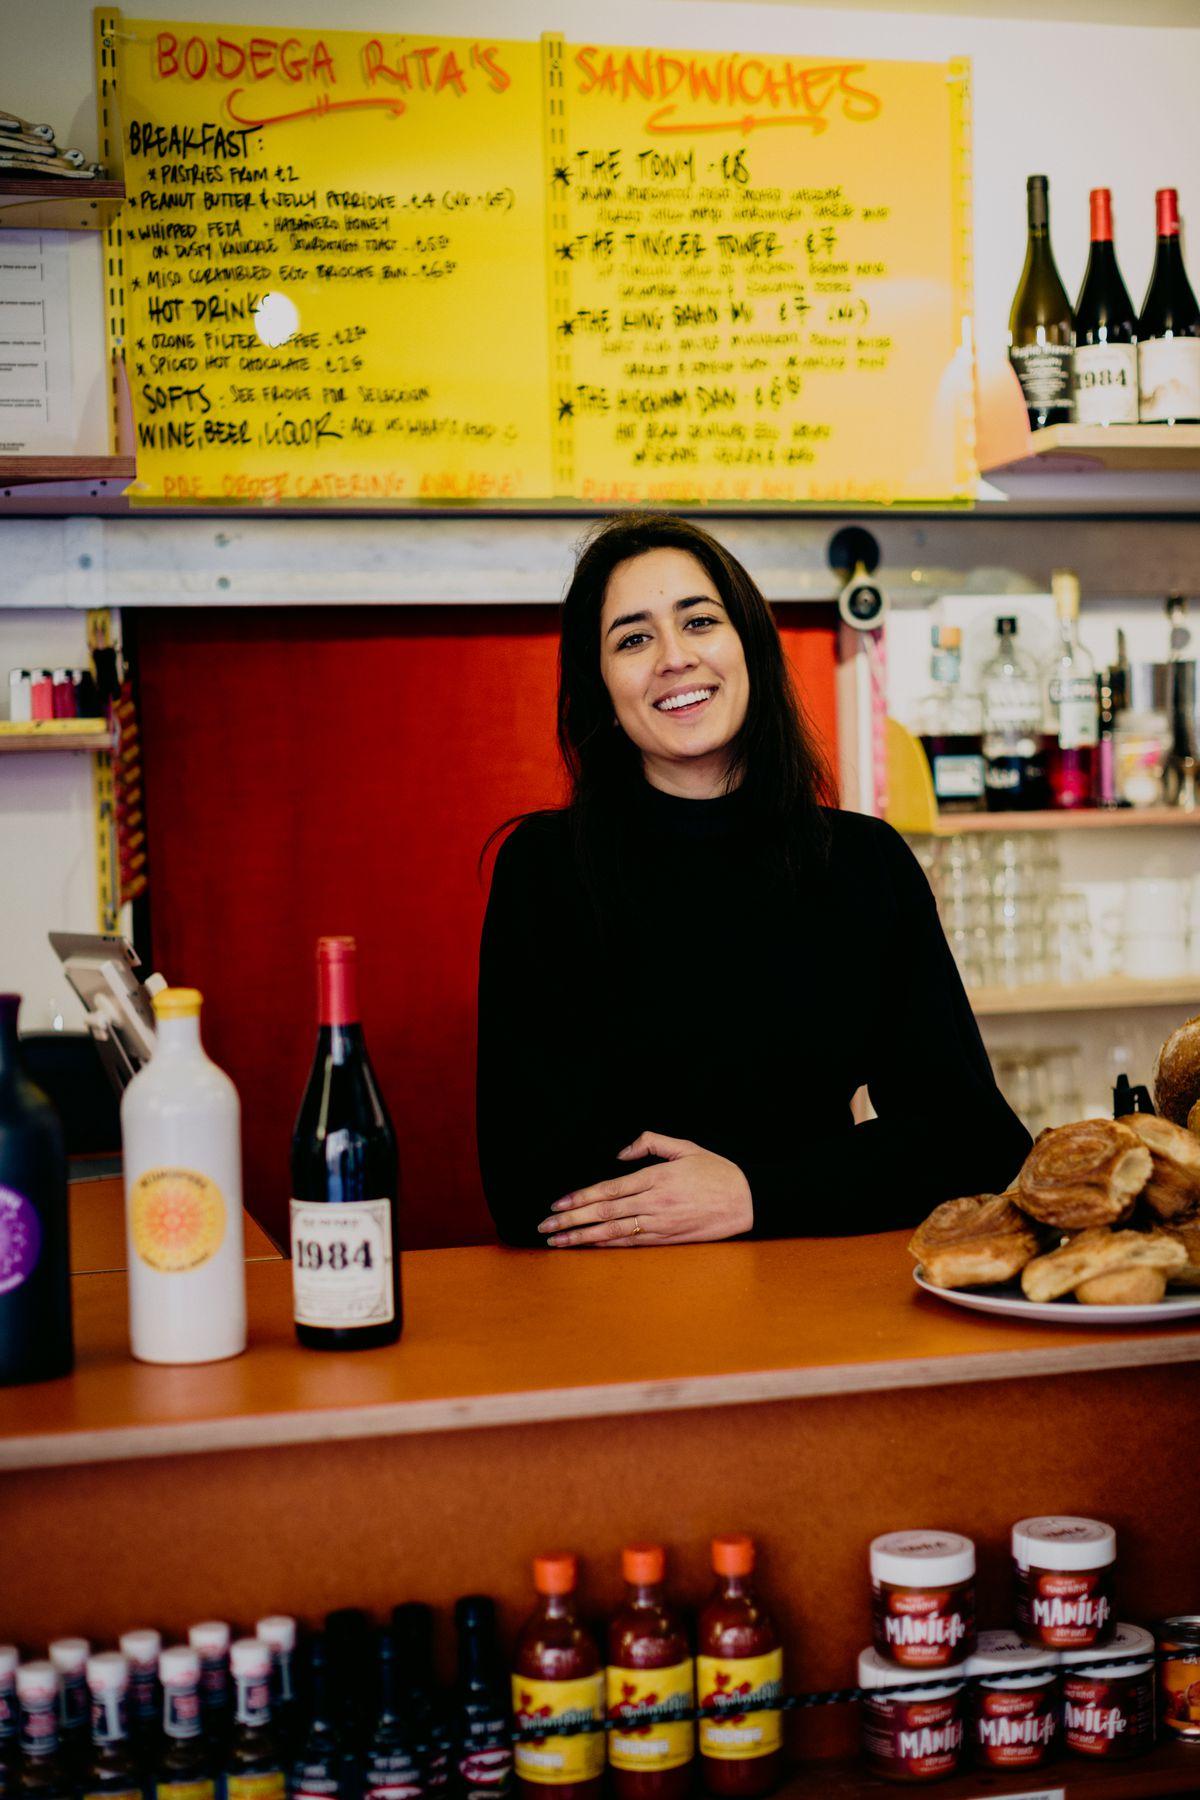 Bodega Rita's at Coal Drops Yard, King's Cross: Missy Flynn behind the bar